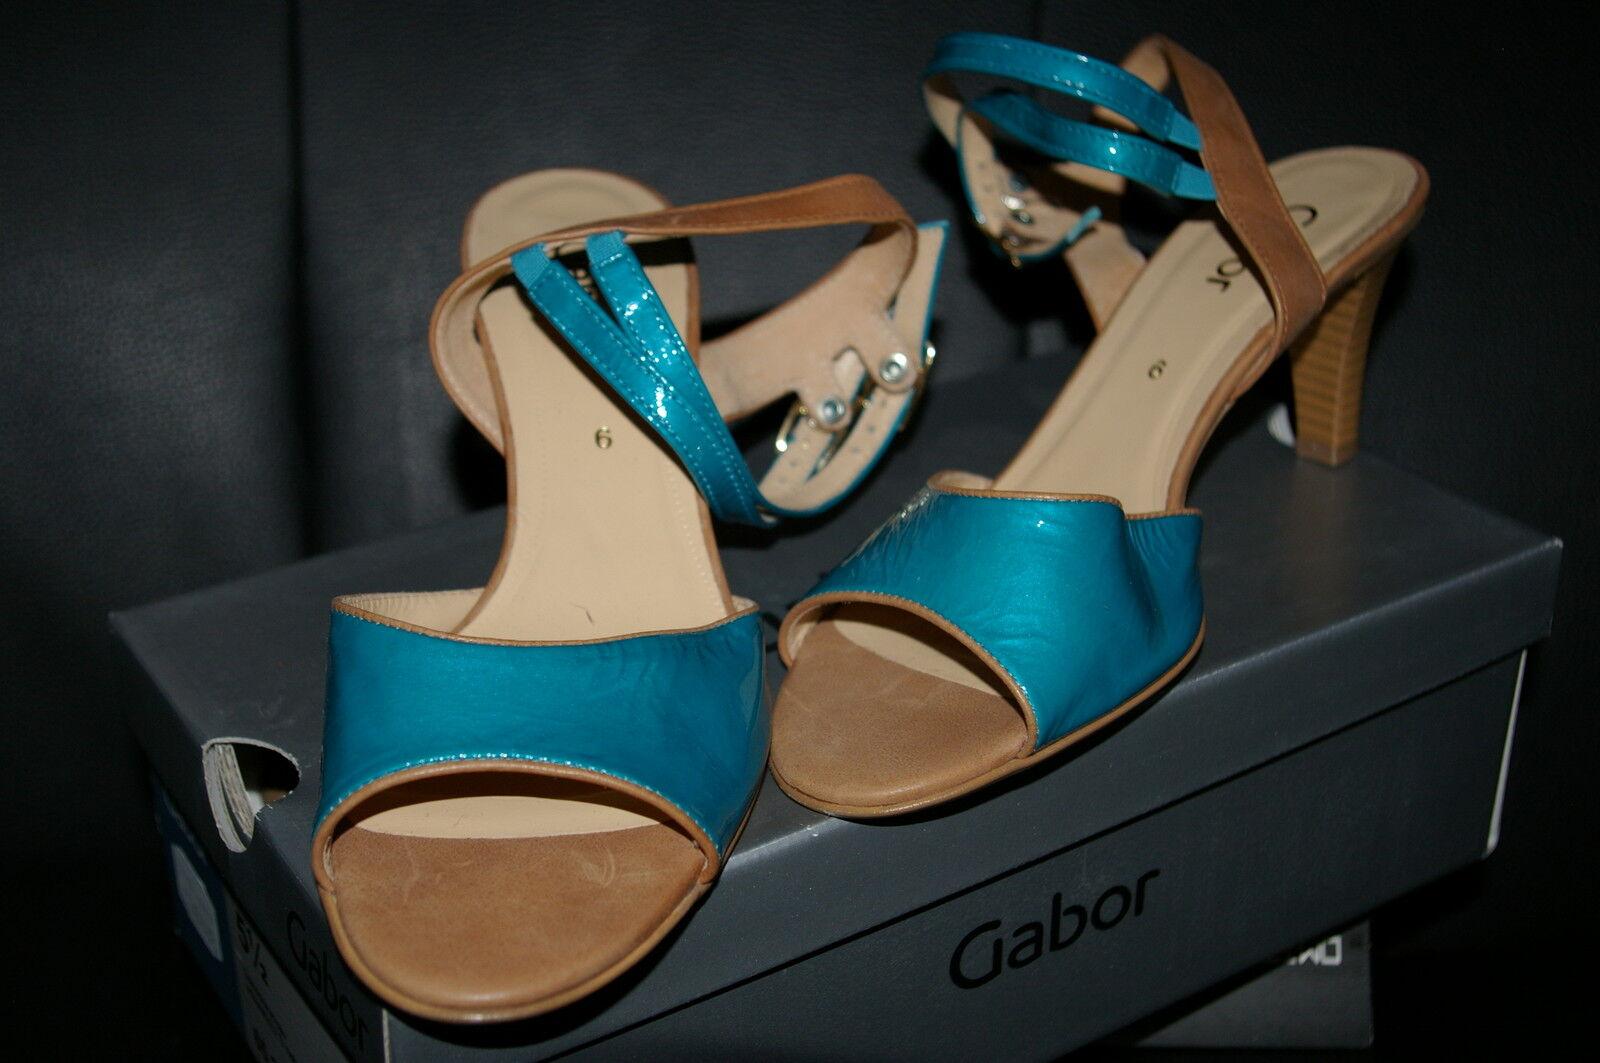 * Gabor Cinturino-Sandali * 1/2 pelle verniciata-Turchese-Blu Tg. 39 1/2 * nuovo